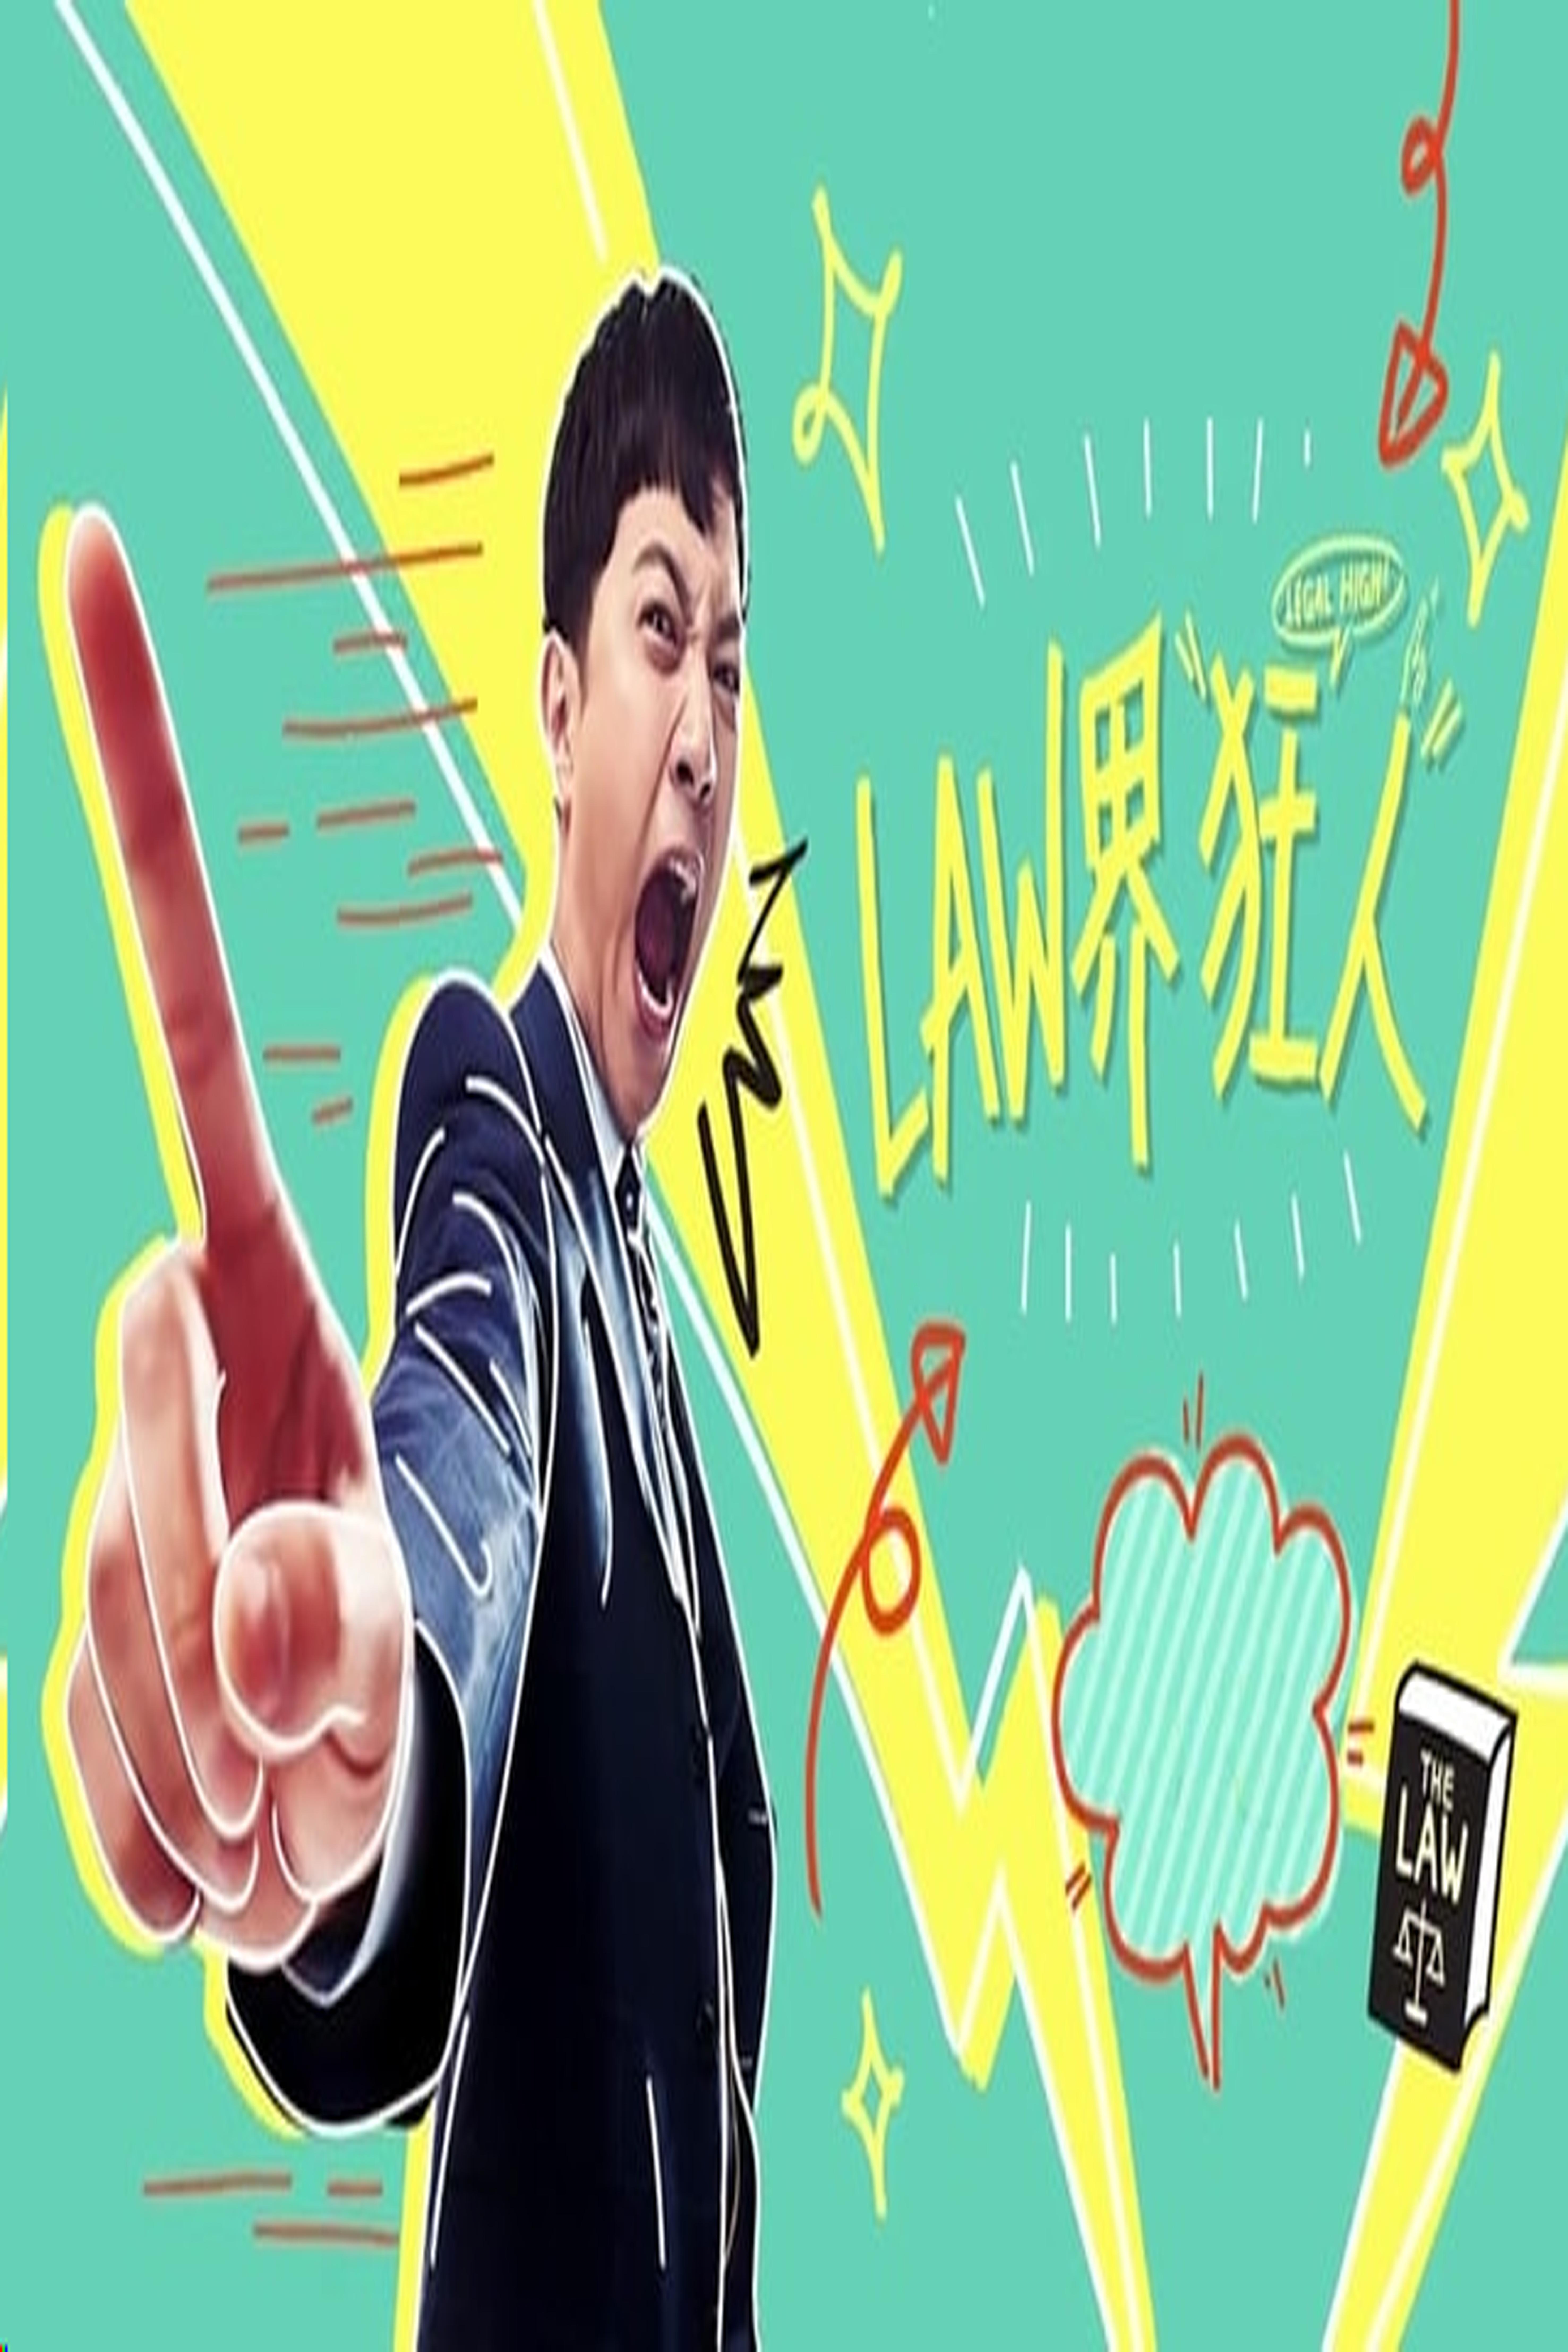 Legal High (Cantonese) - 合法高